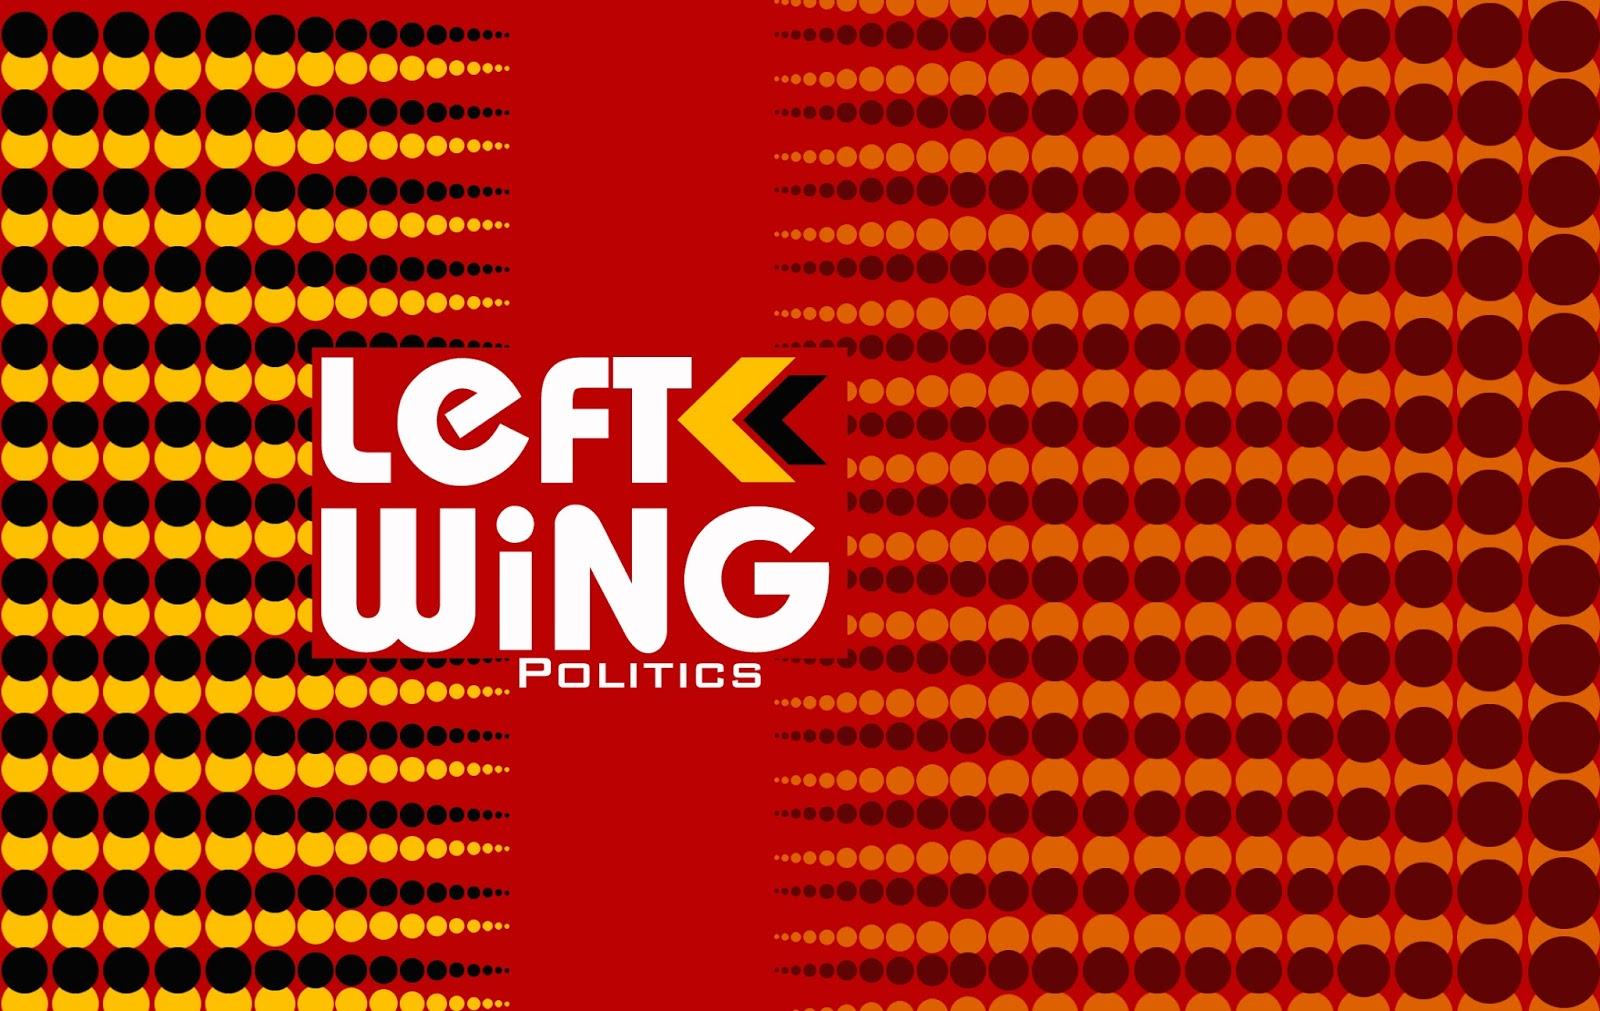 https://3.bp.blogspot.com/-4wOuhYUiCYA/VwZak18-SqI/AAAAAAAAhco/OfmNiDOH3z0AyYf2d3WfYAuC-zJhgiang/s1600/left-wing-politics-11.jpg